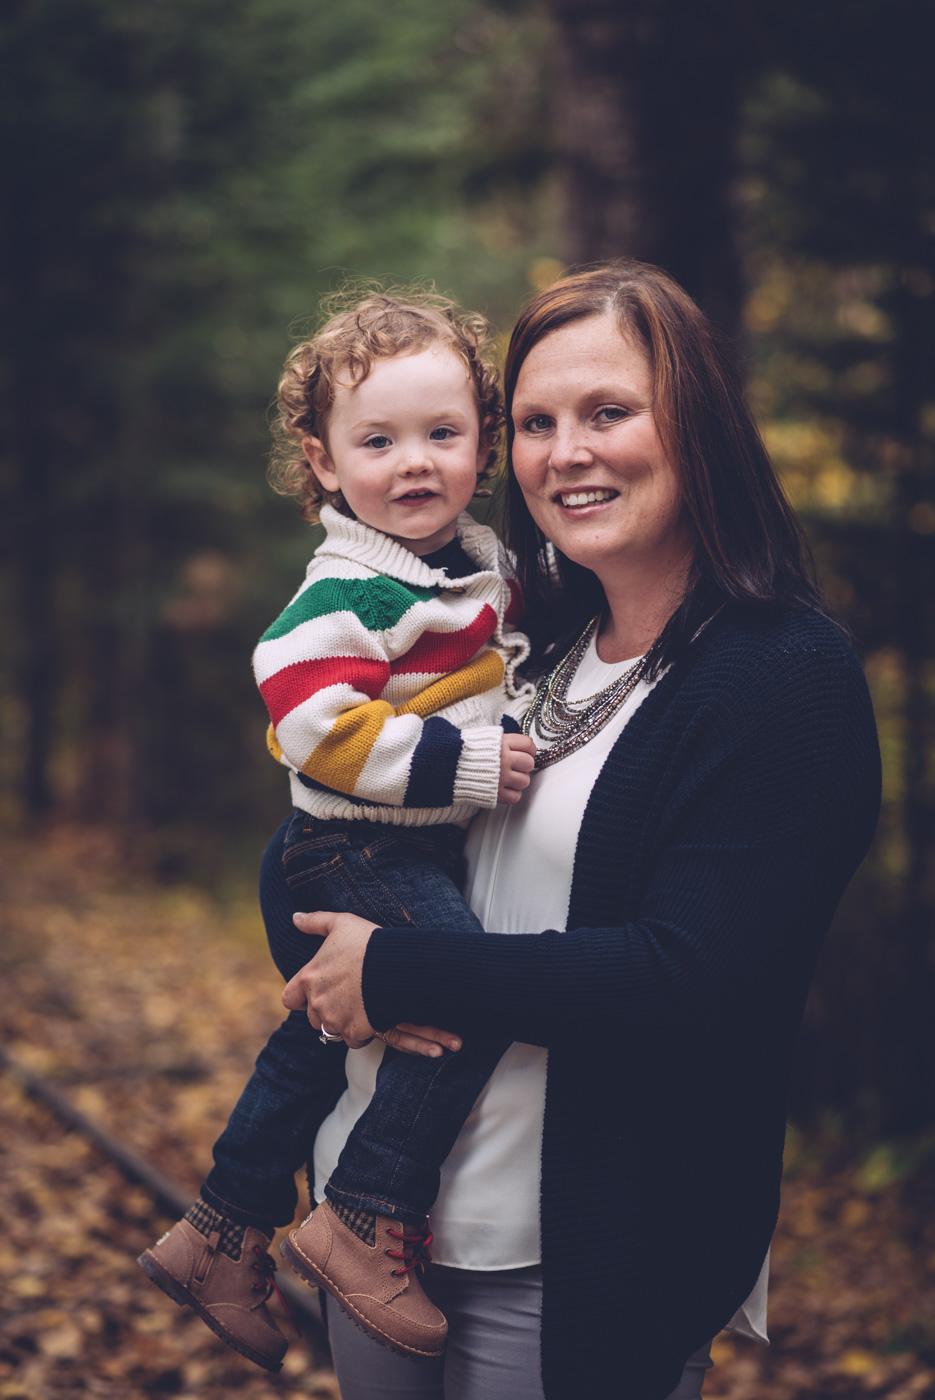 kristi_family_portraits_blog7.jpg